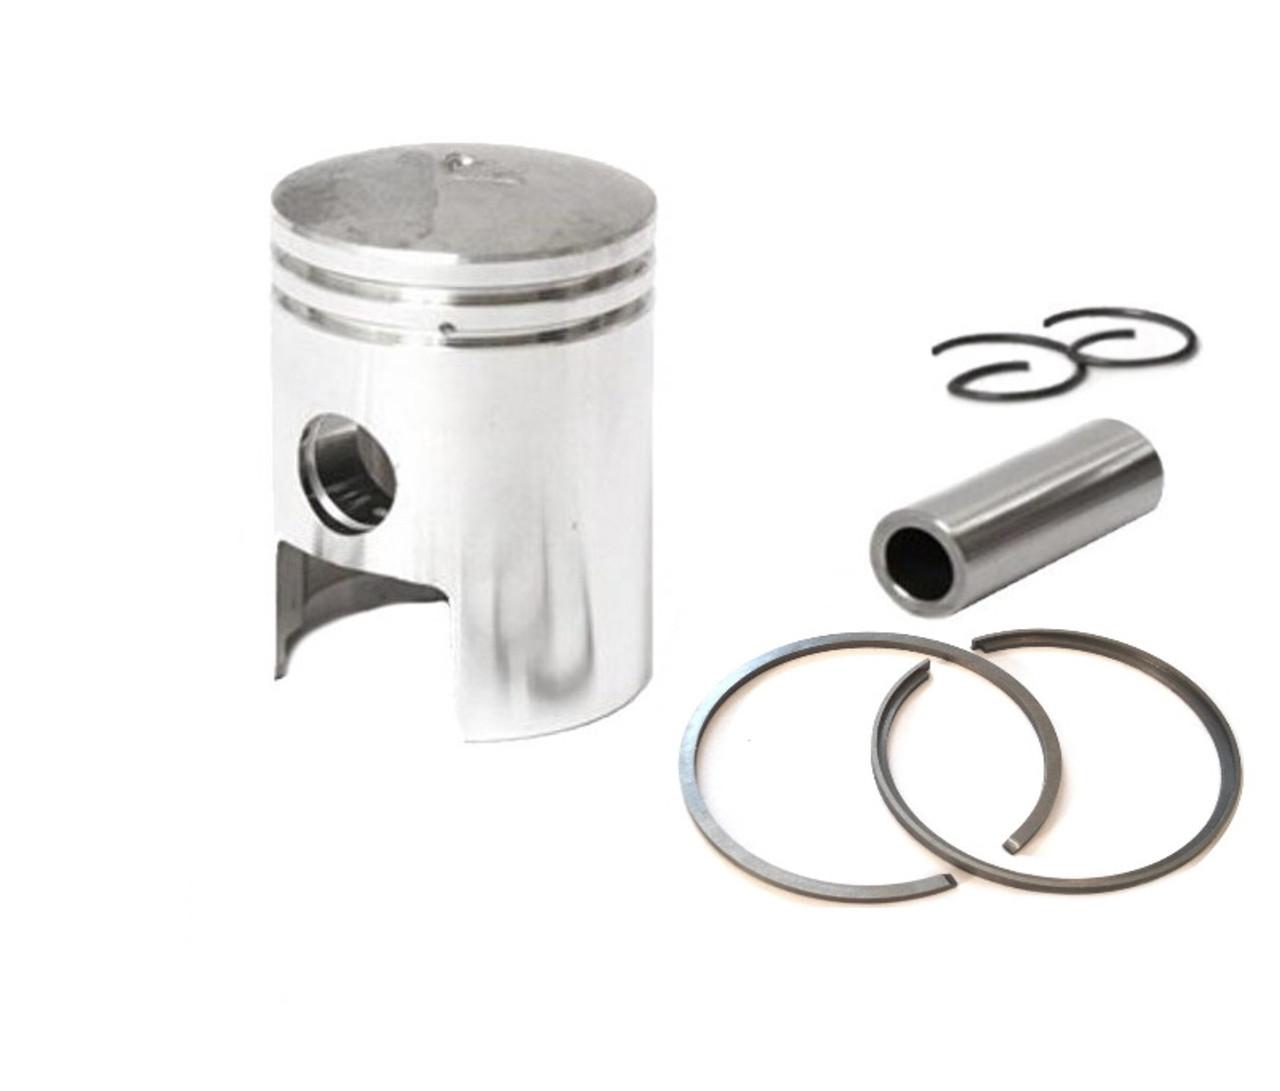 Replacement Vespa 38.2mm Piston Kit - 10mm Wrist Pin